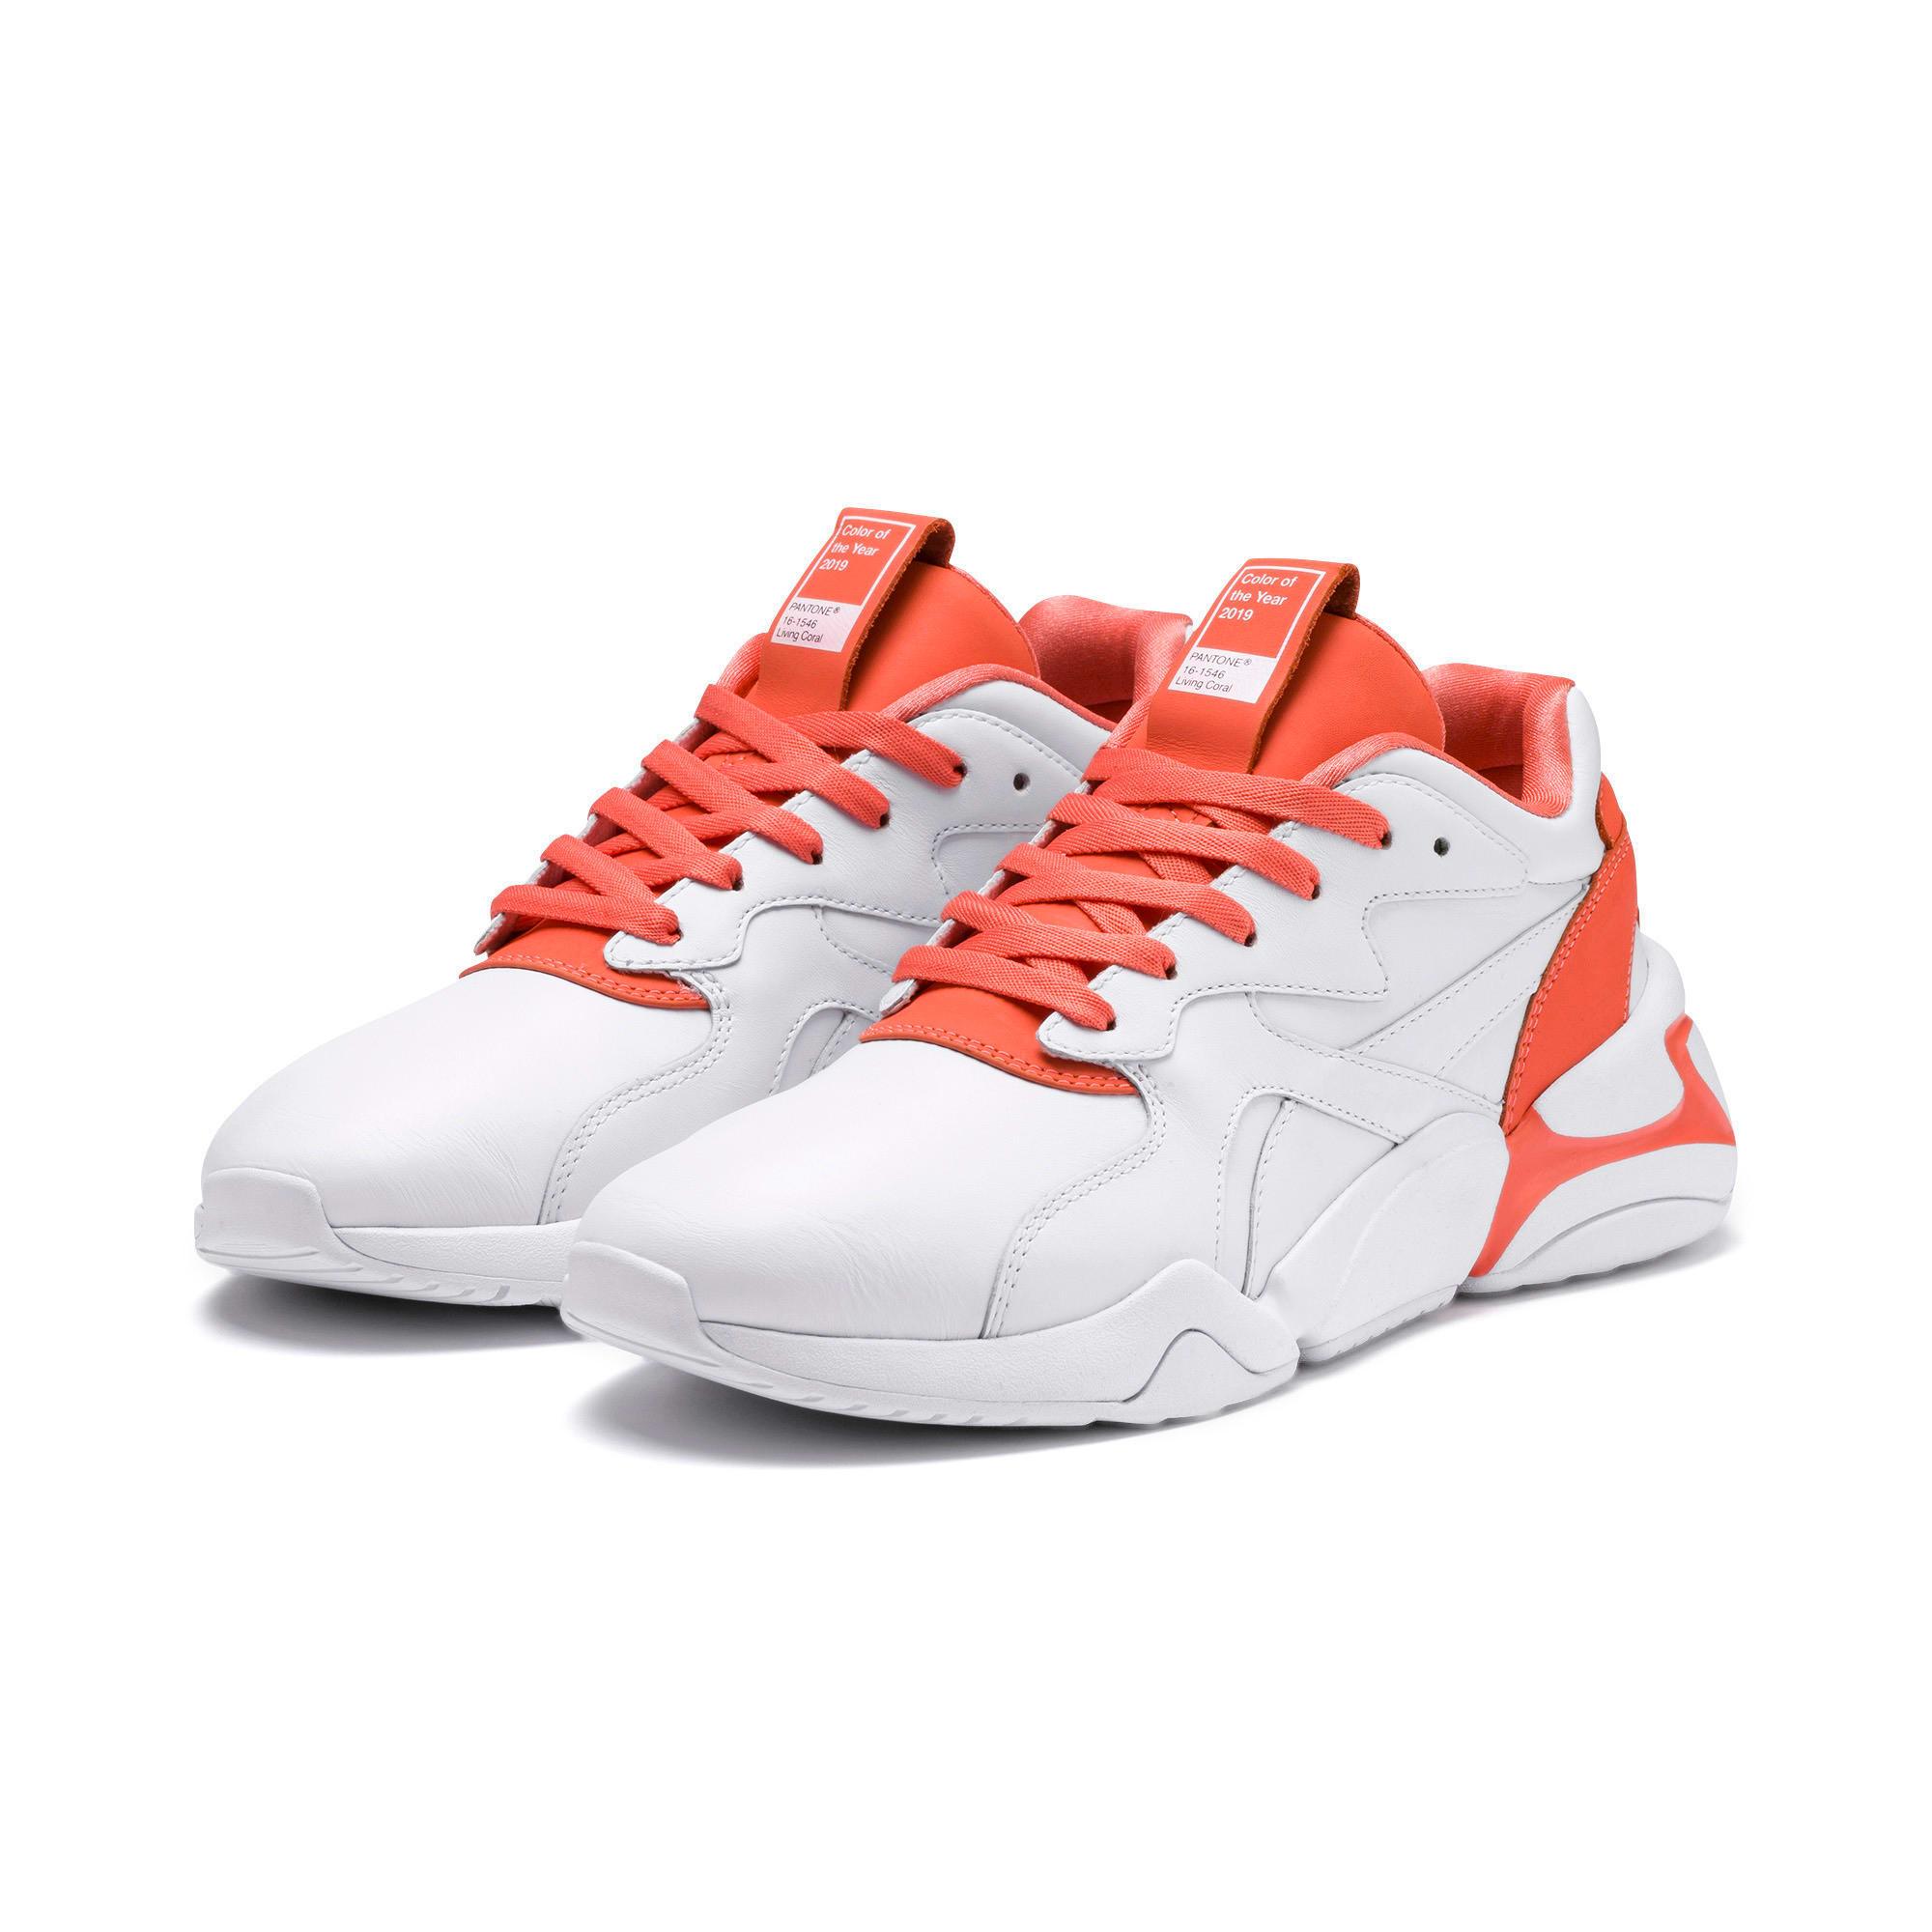 Thumbnail 2 of Nova x Pantone 2 Women's Sneakers, Puma White-Living Coral, medium